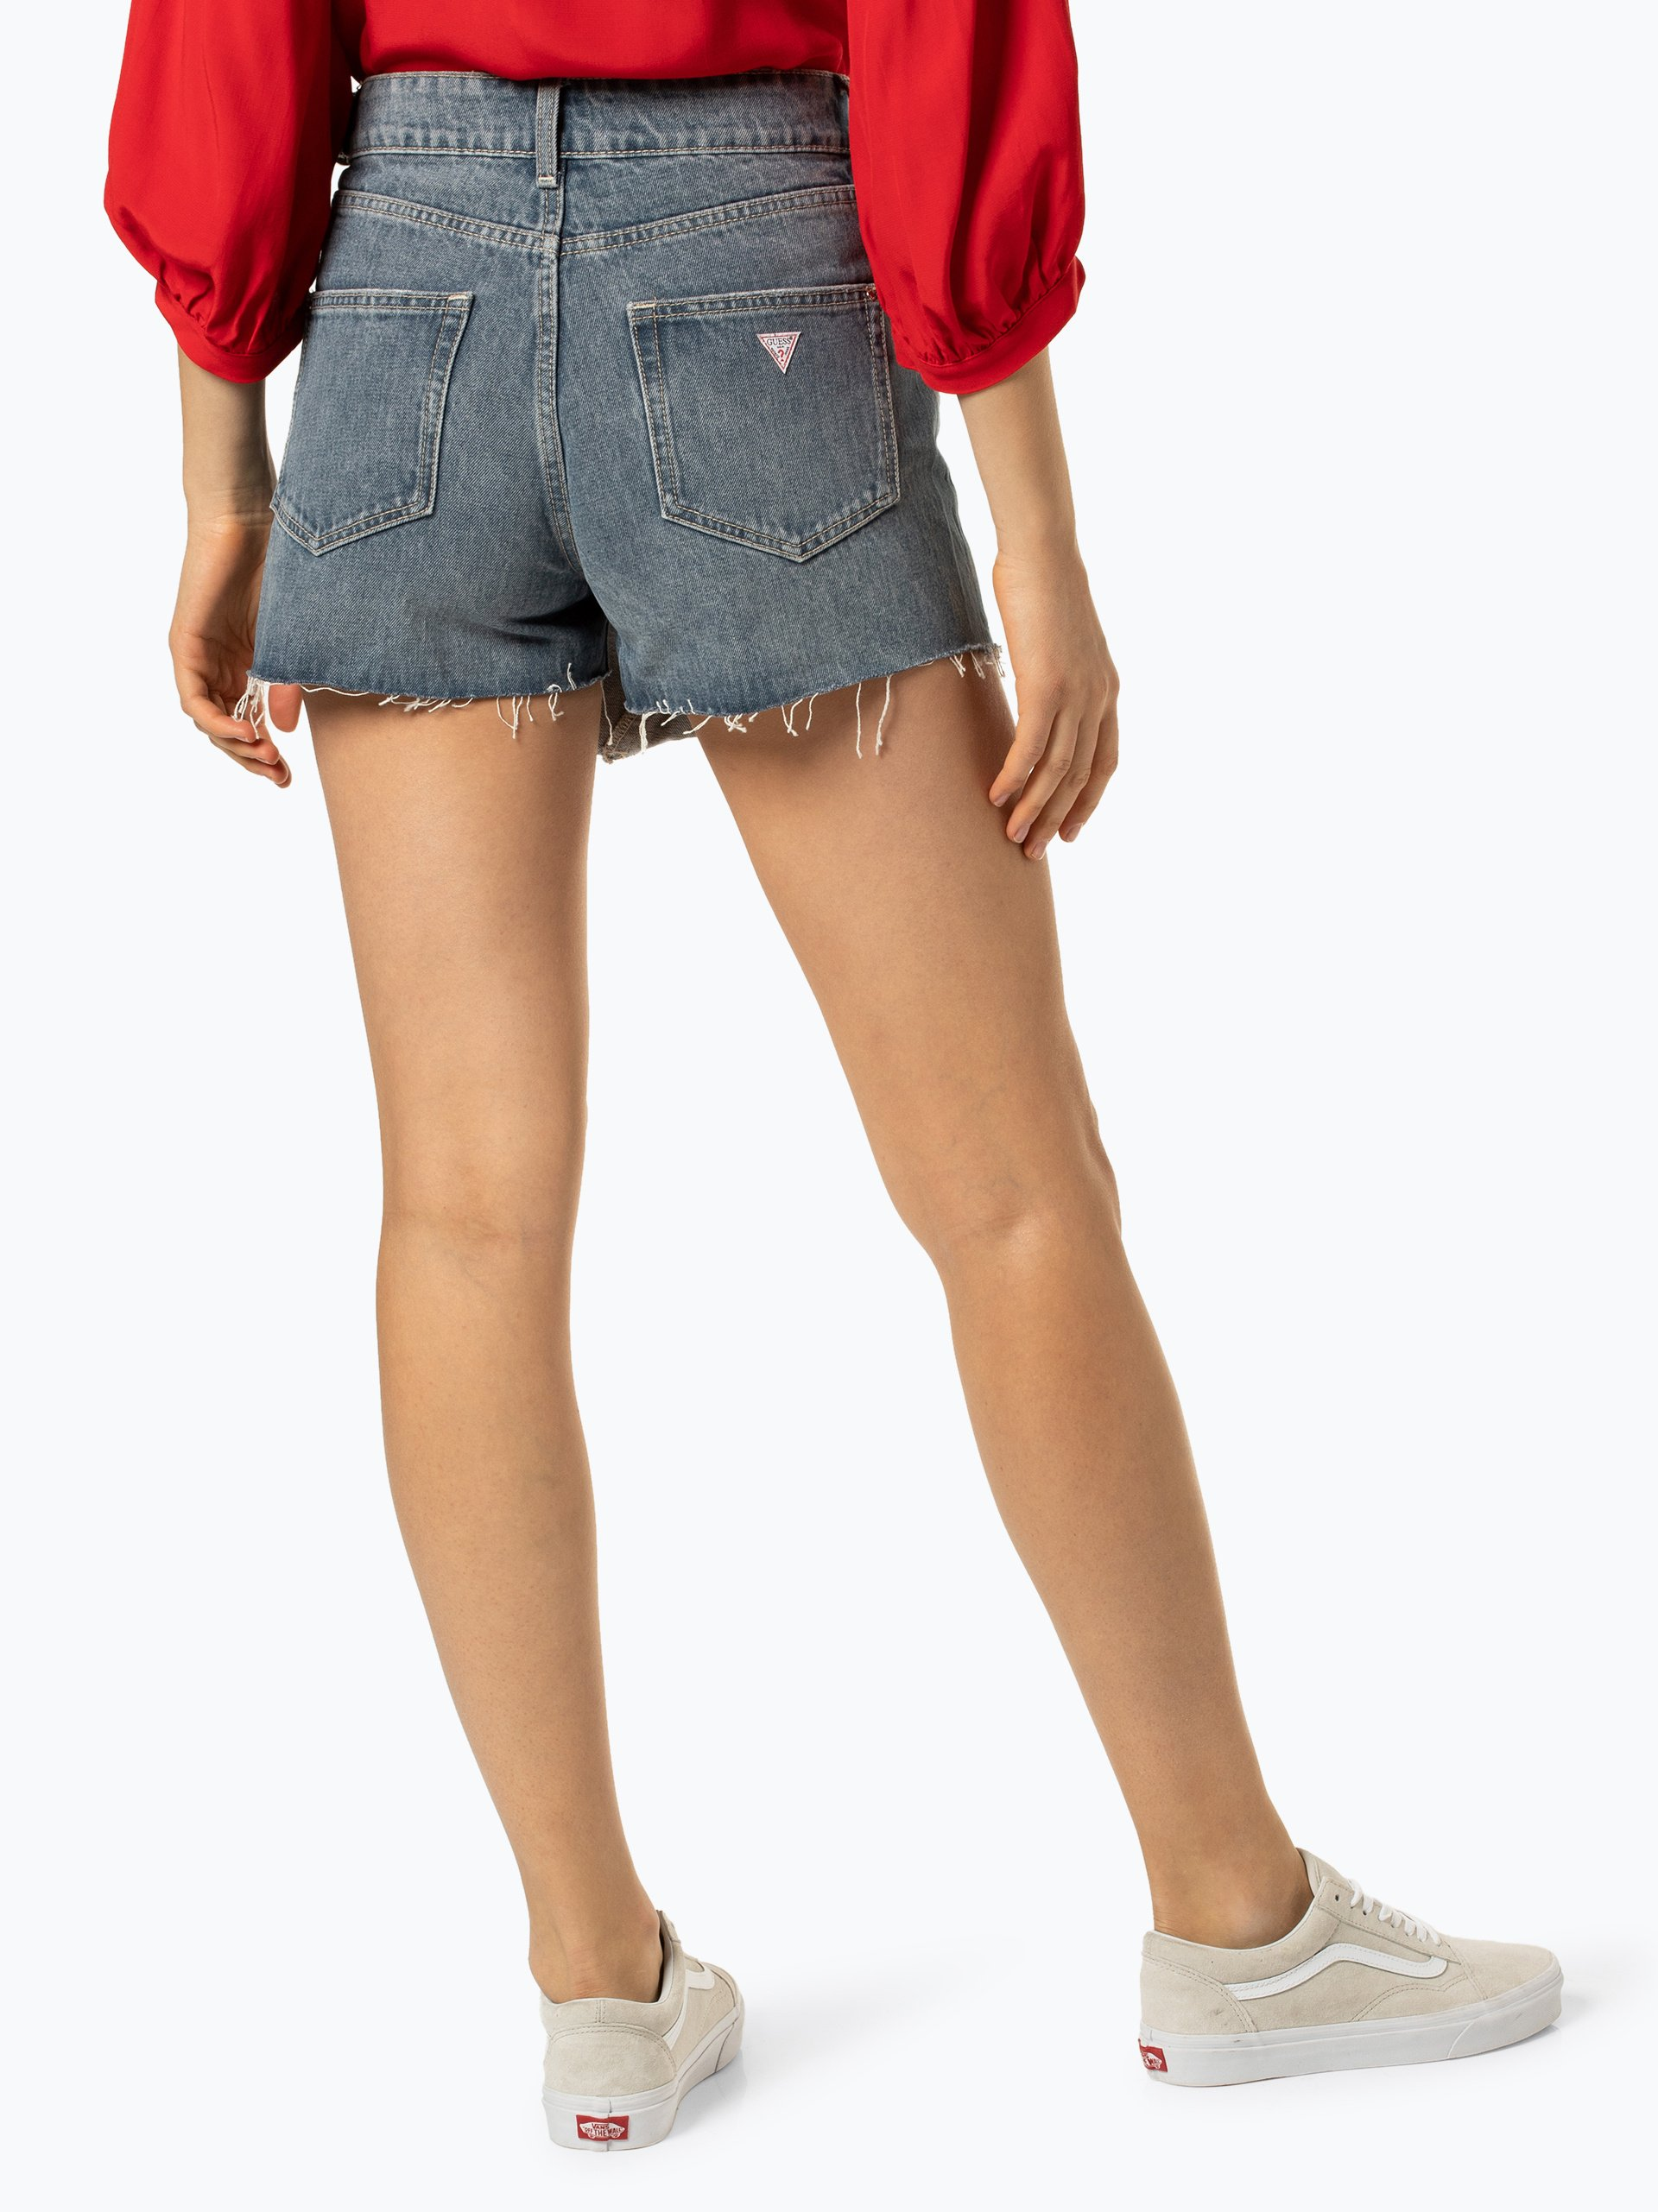 Guess Jeans Damen Jeansshorts